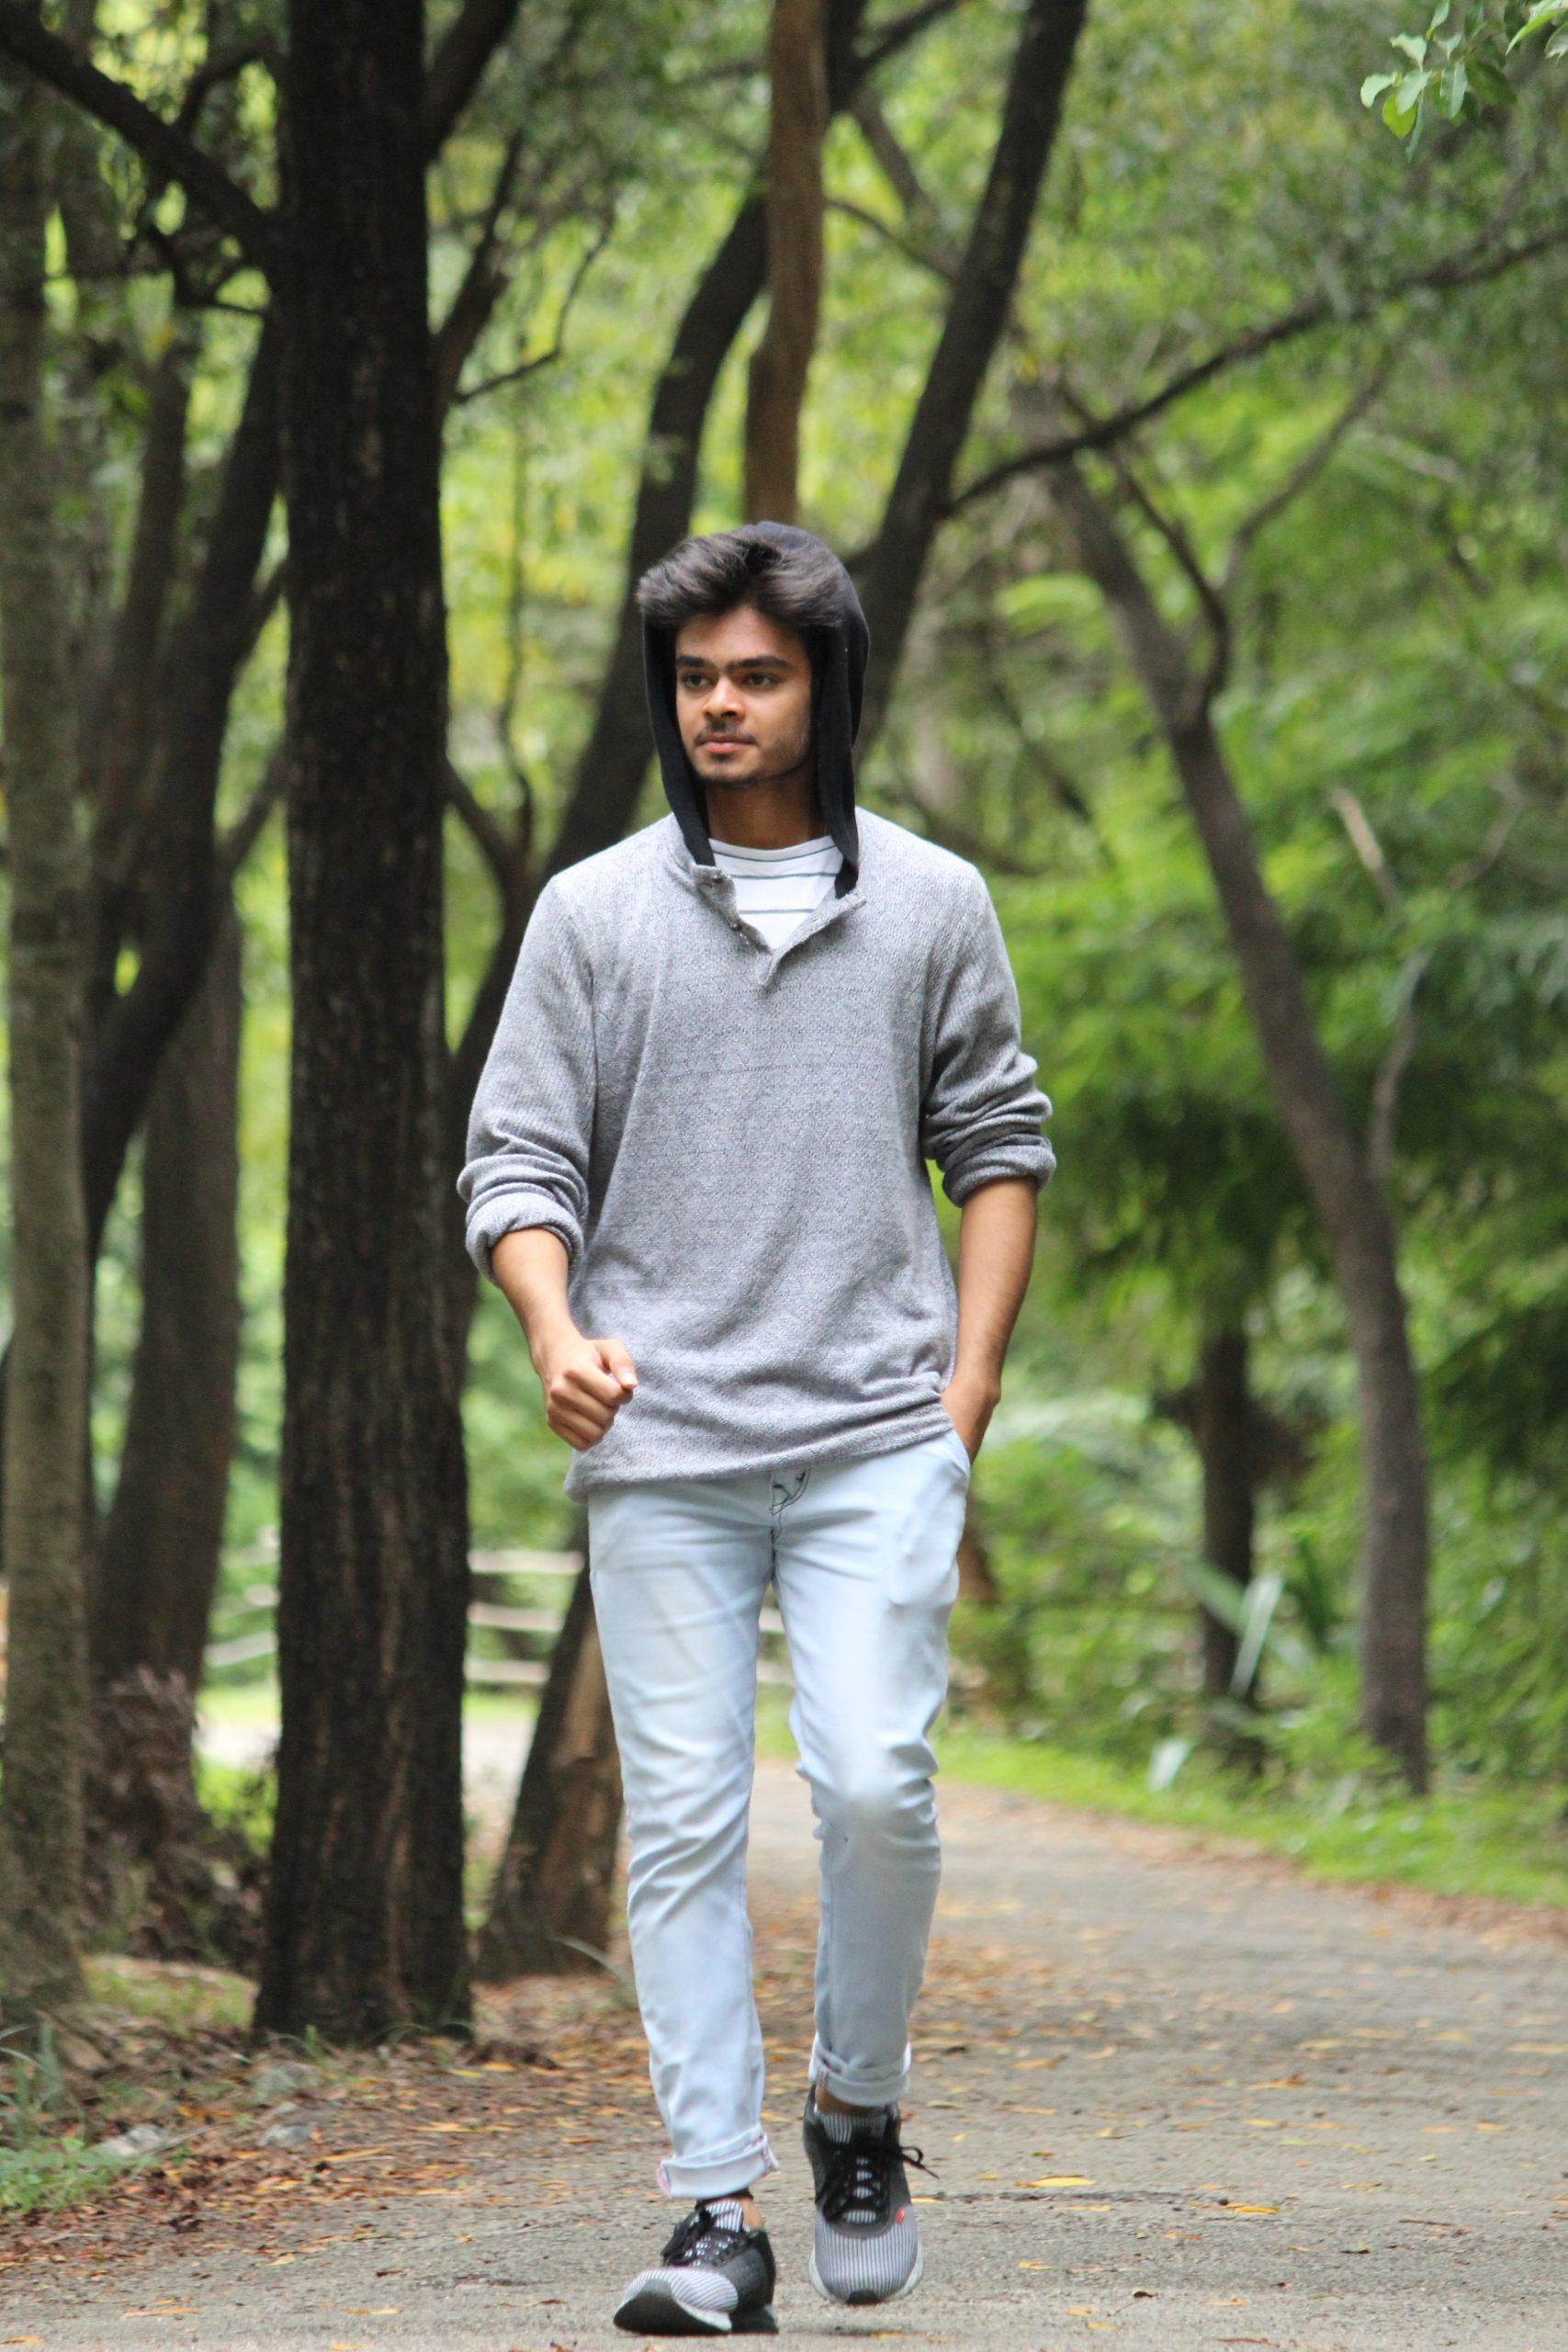 Boy walking in the forest